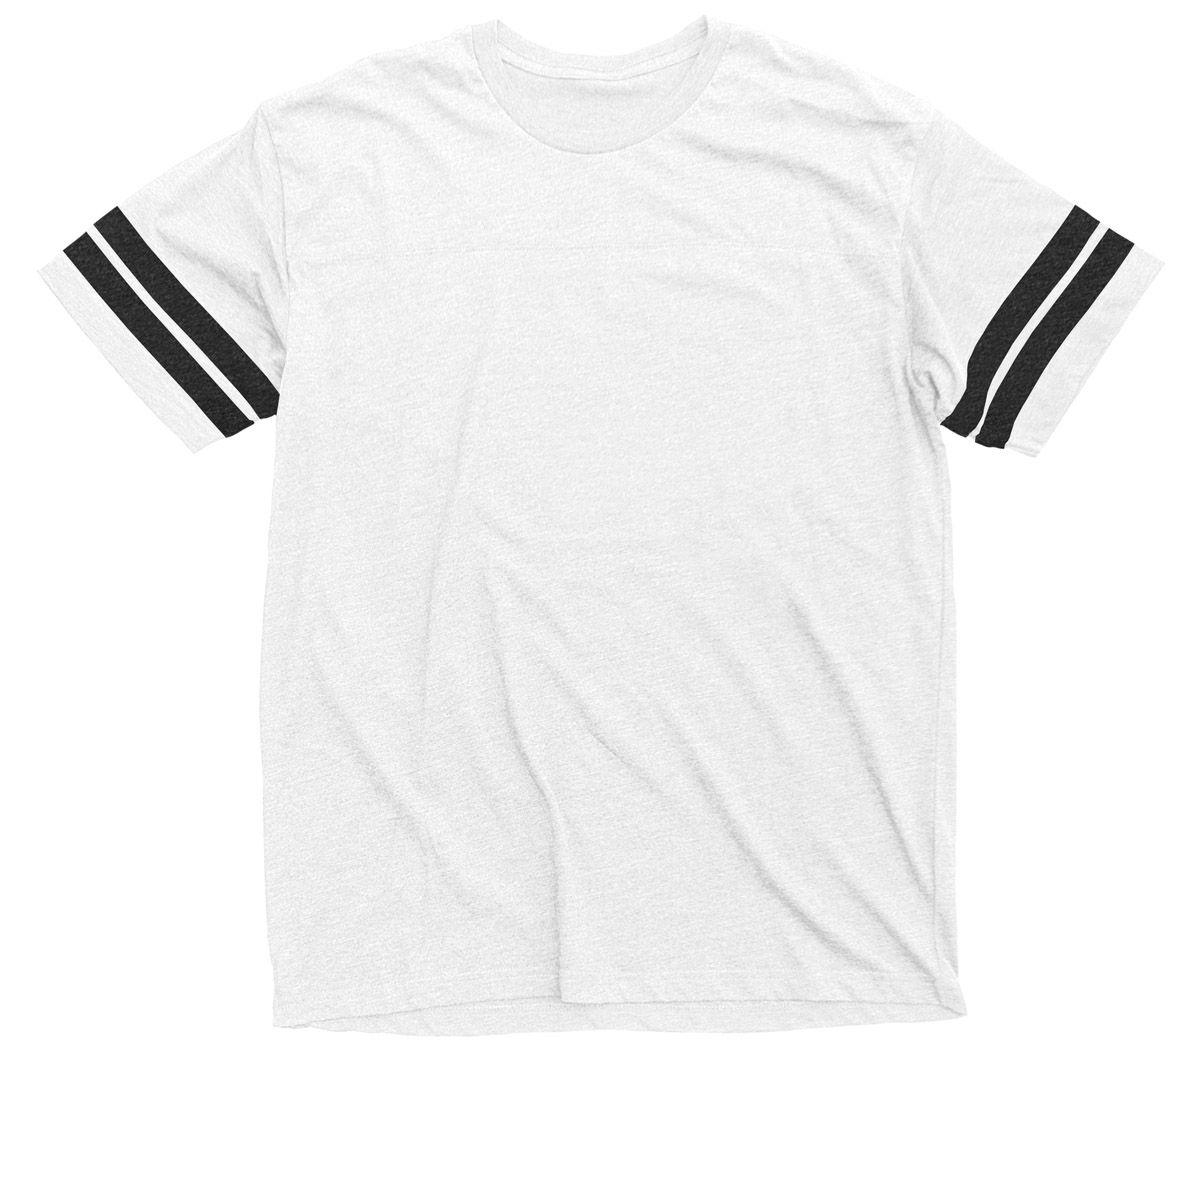 T Shirt Design Tool Make Your Own Shirt Design Bonfire In 2020 Make Your Own Shirt Design Your Shirt Custom Shirts